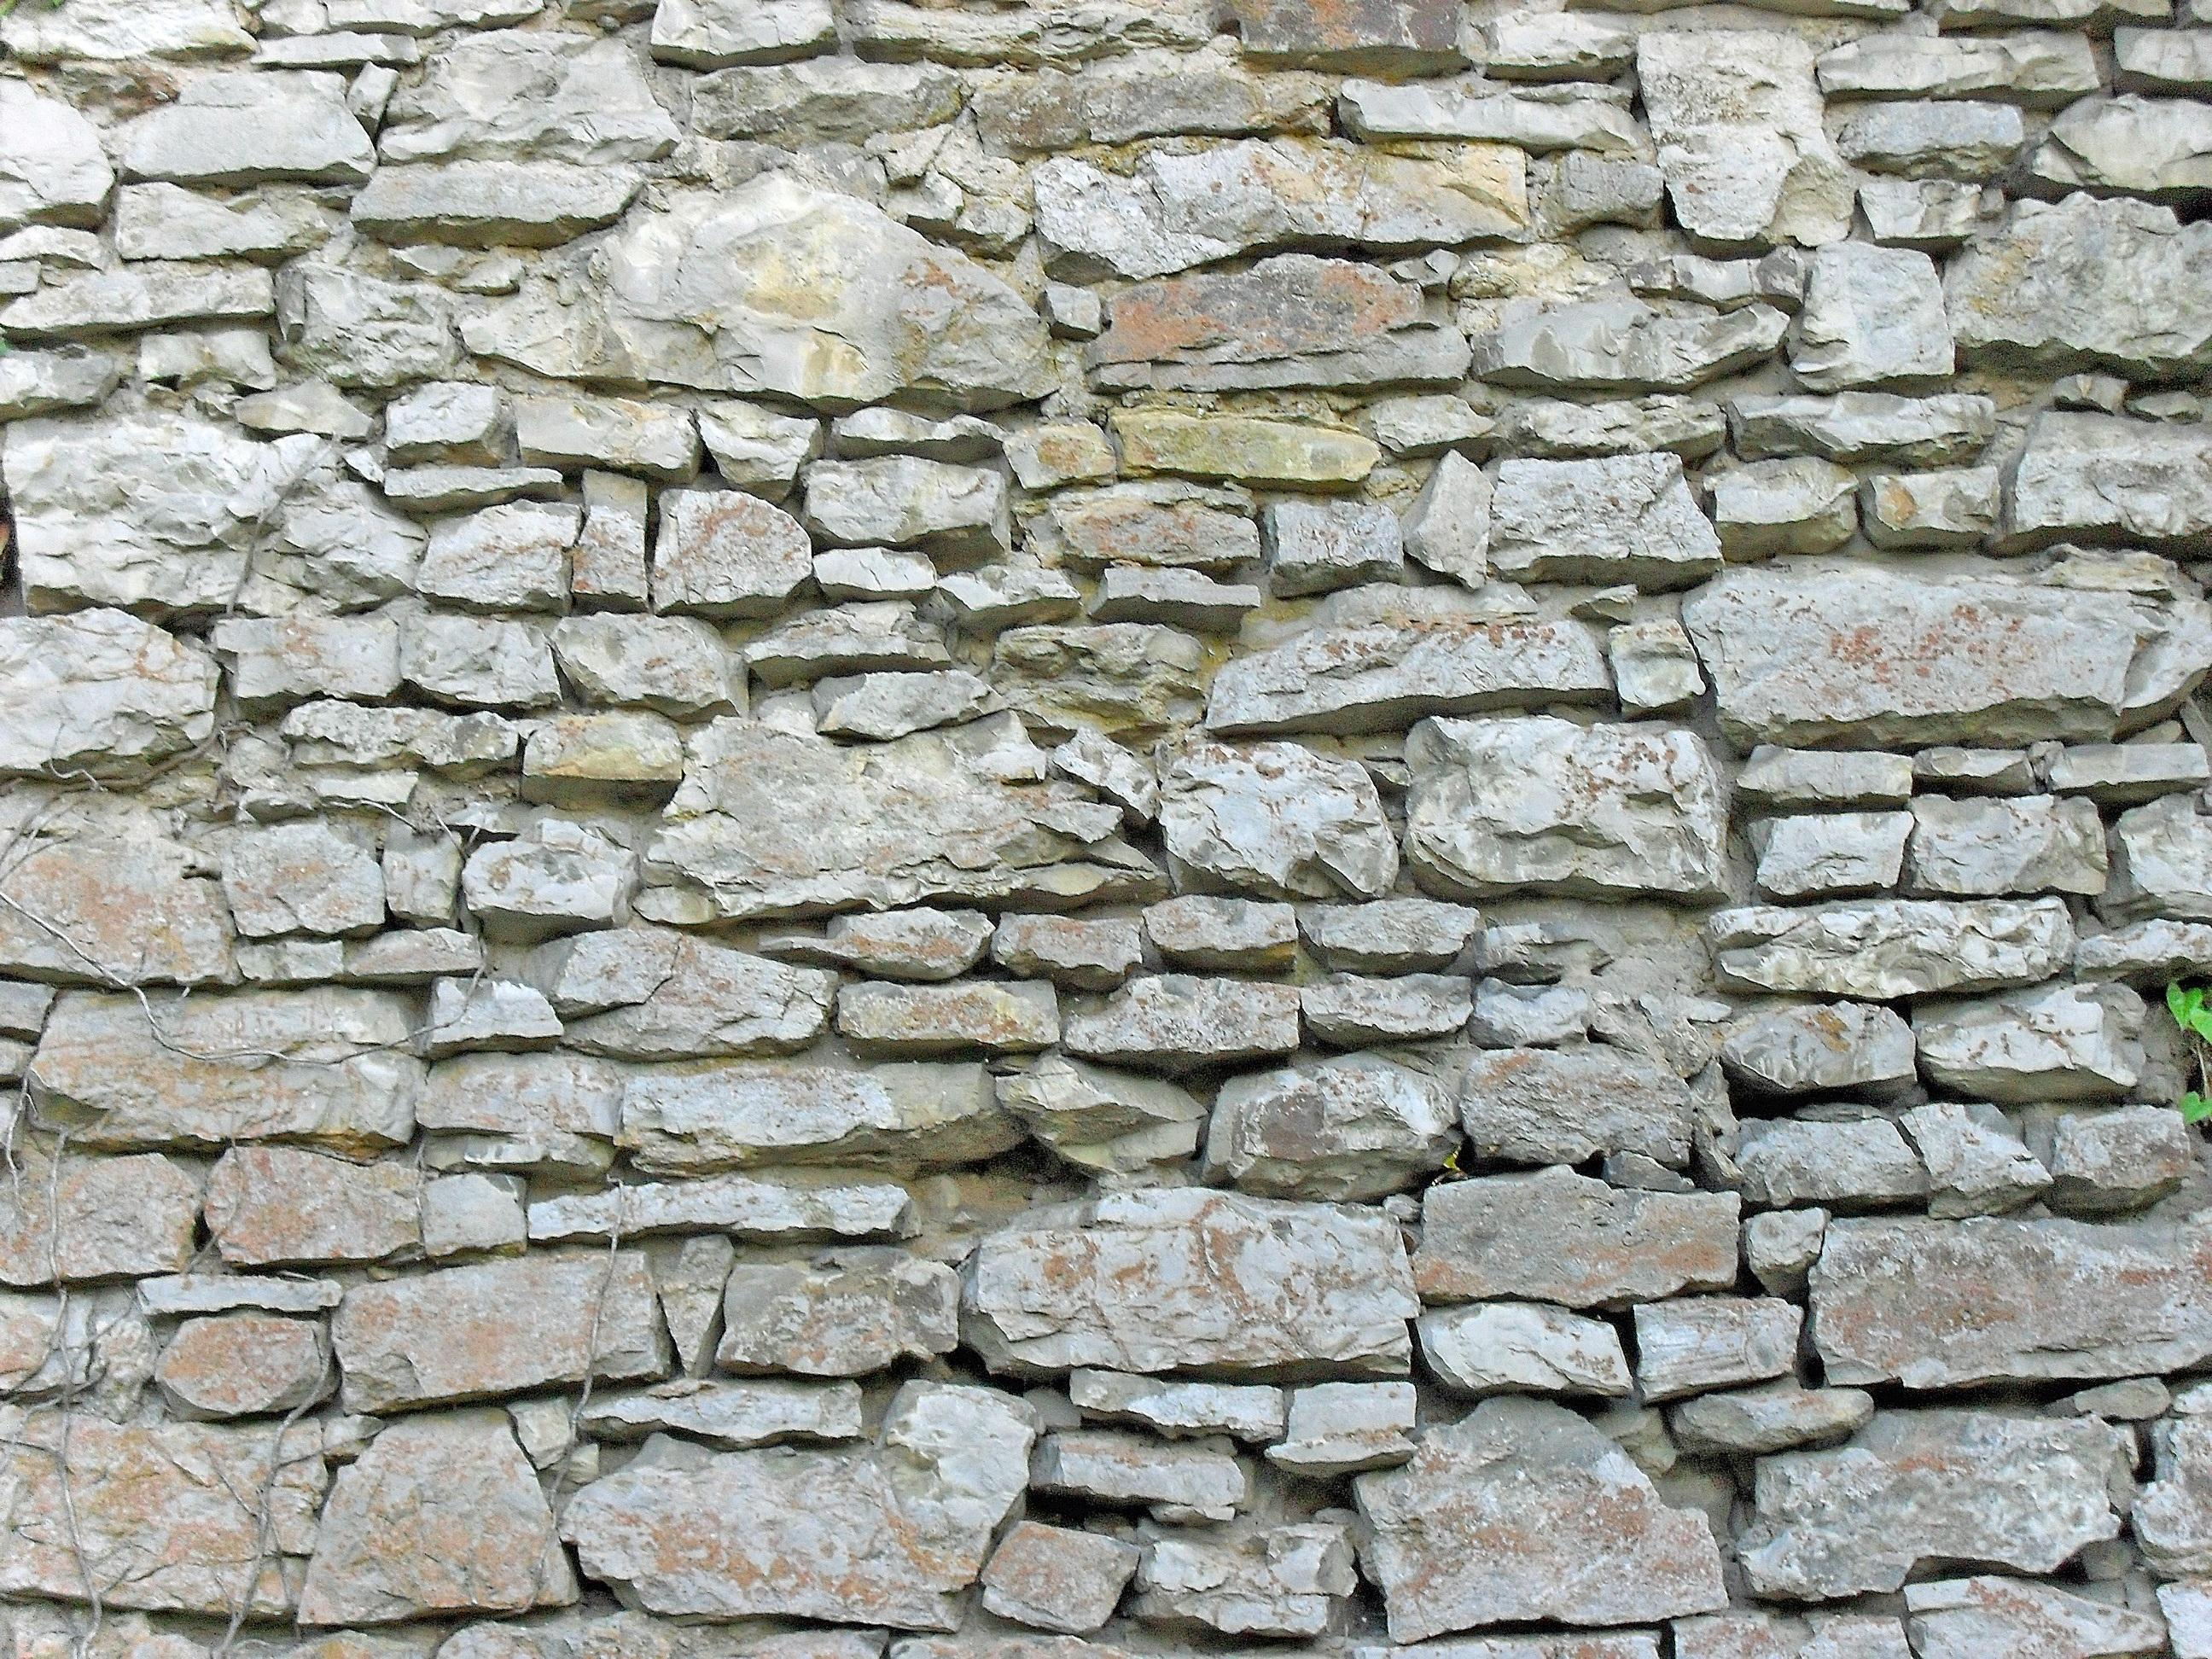 rock piso edificio guijarro pared piedra pared de piedra ladrillo material albailera piedra natural piso la